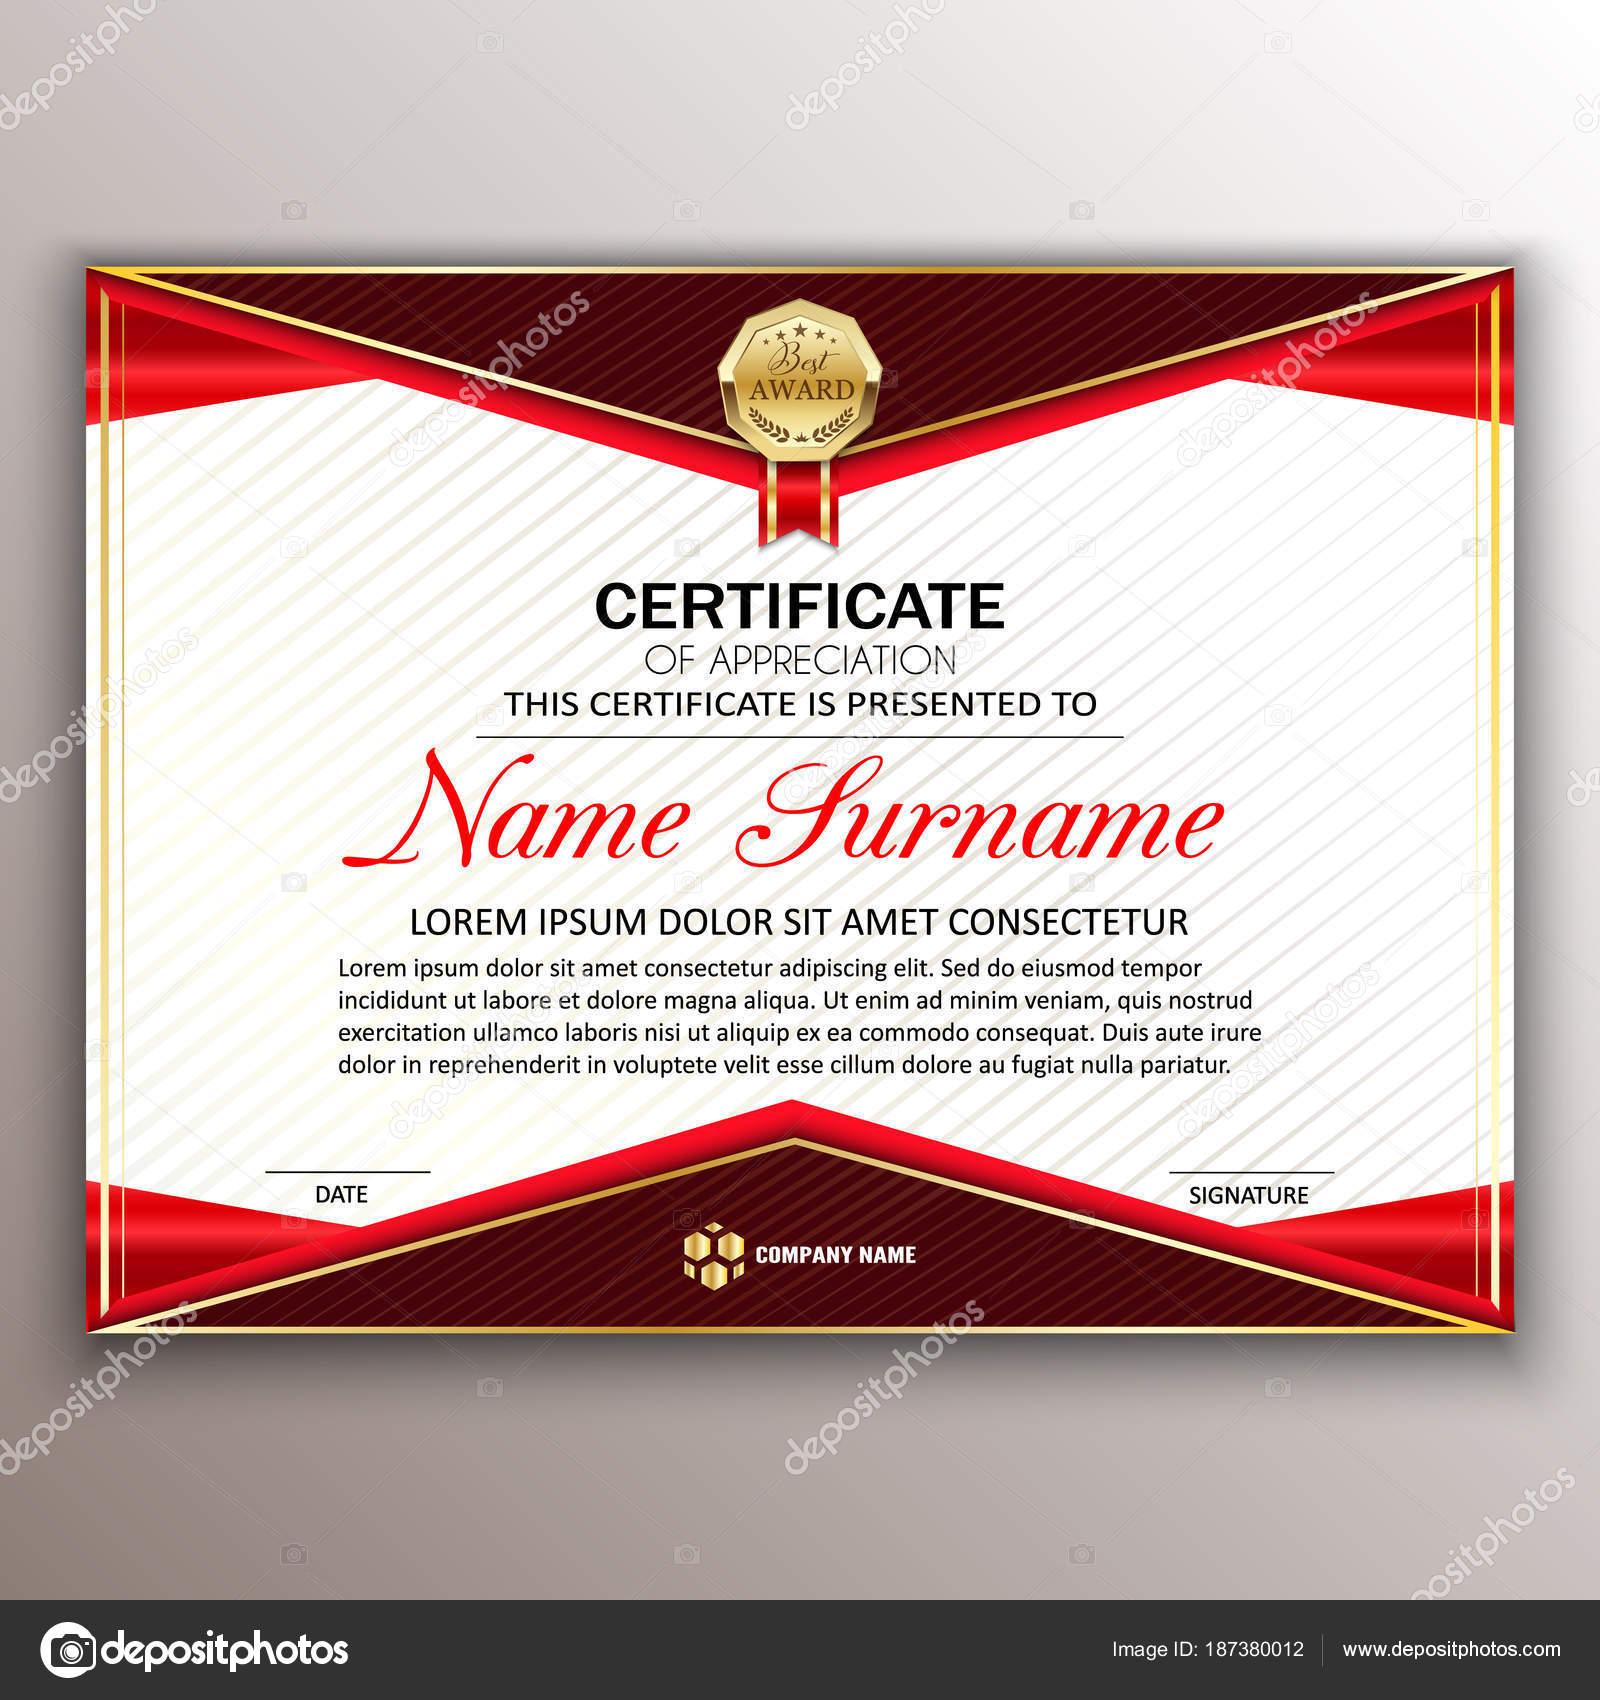 Beautiful Certificate Template Design With Best Award Symbol Ve